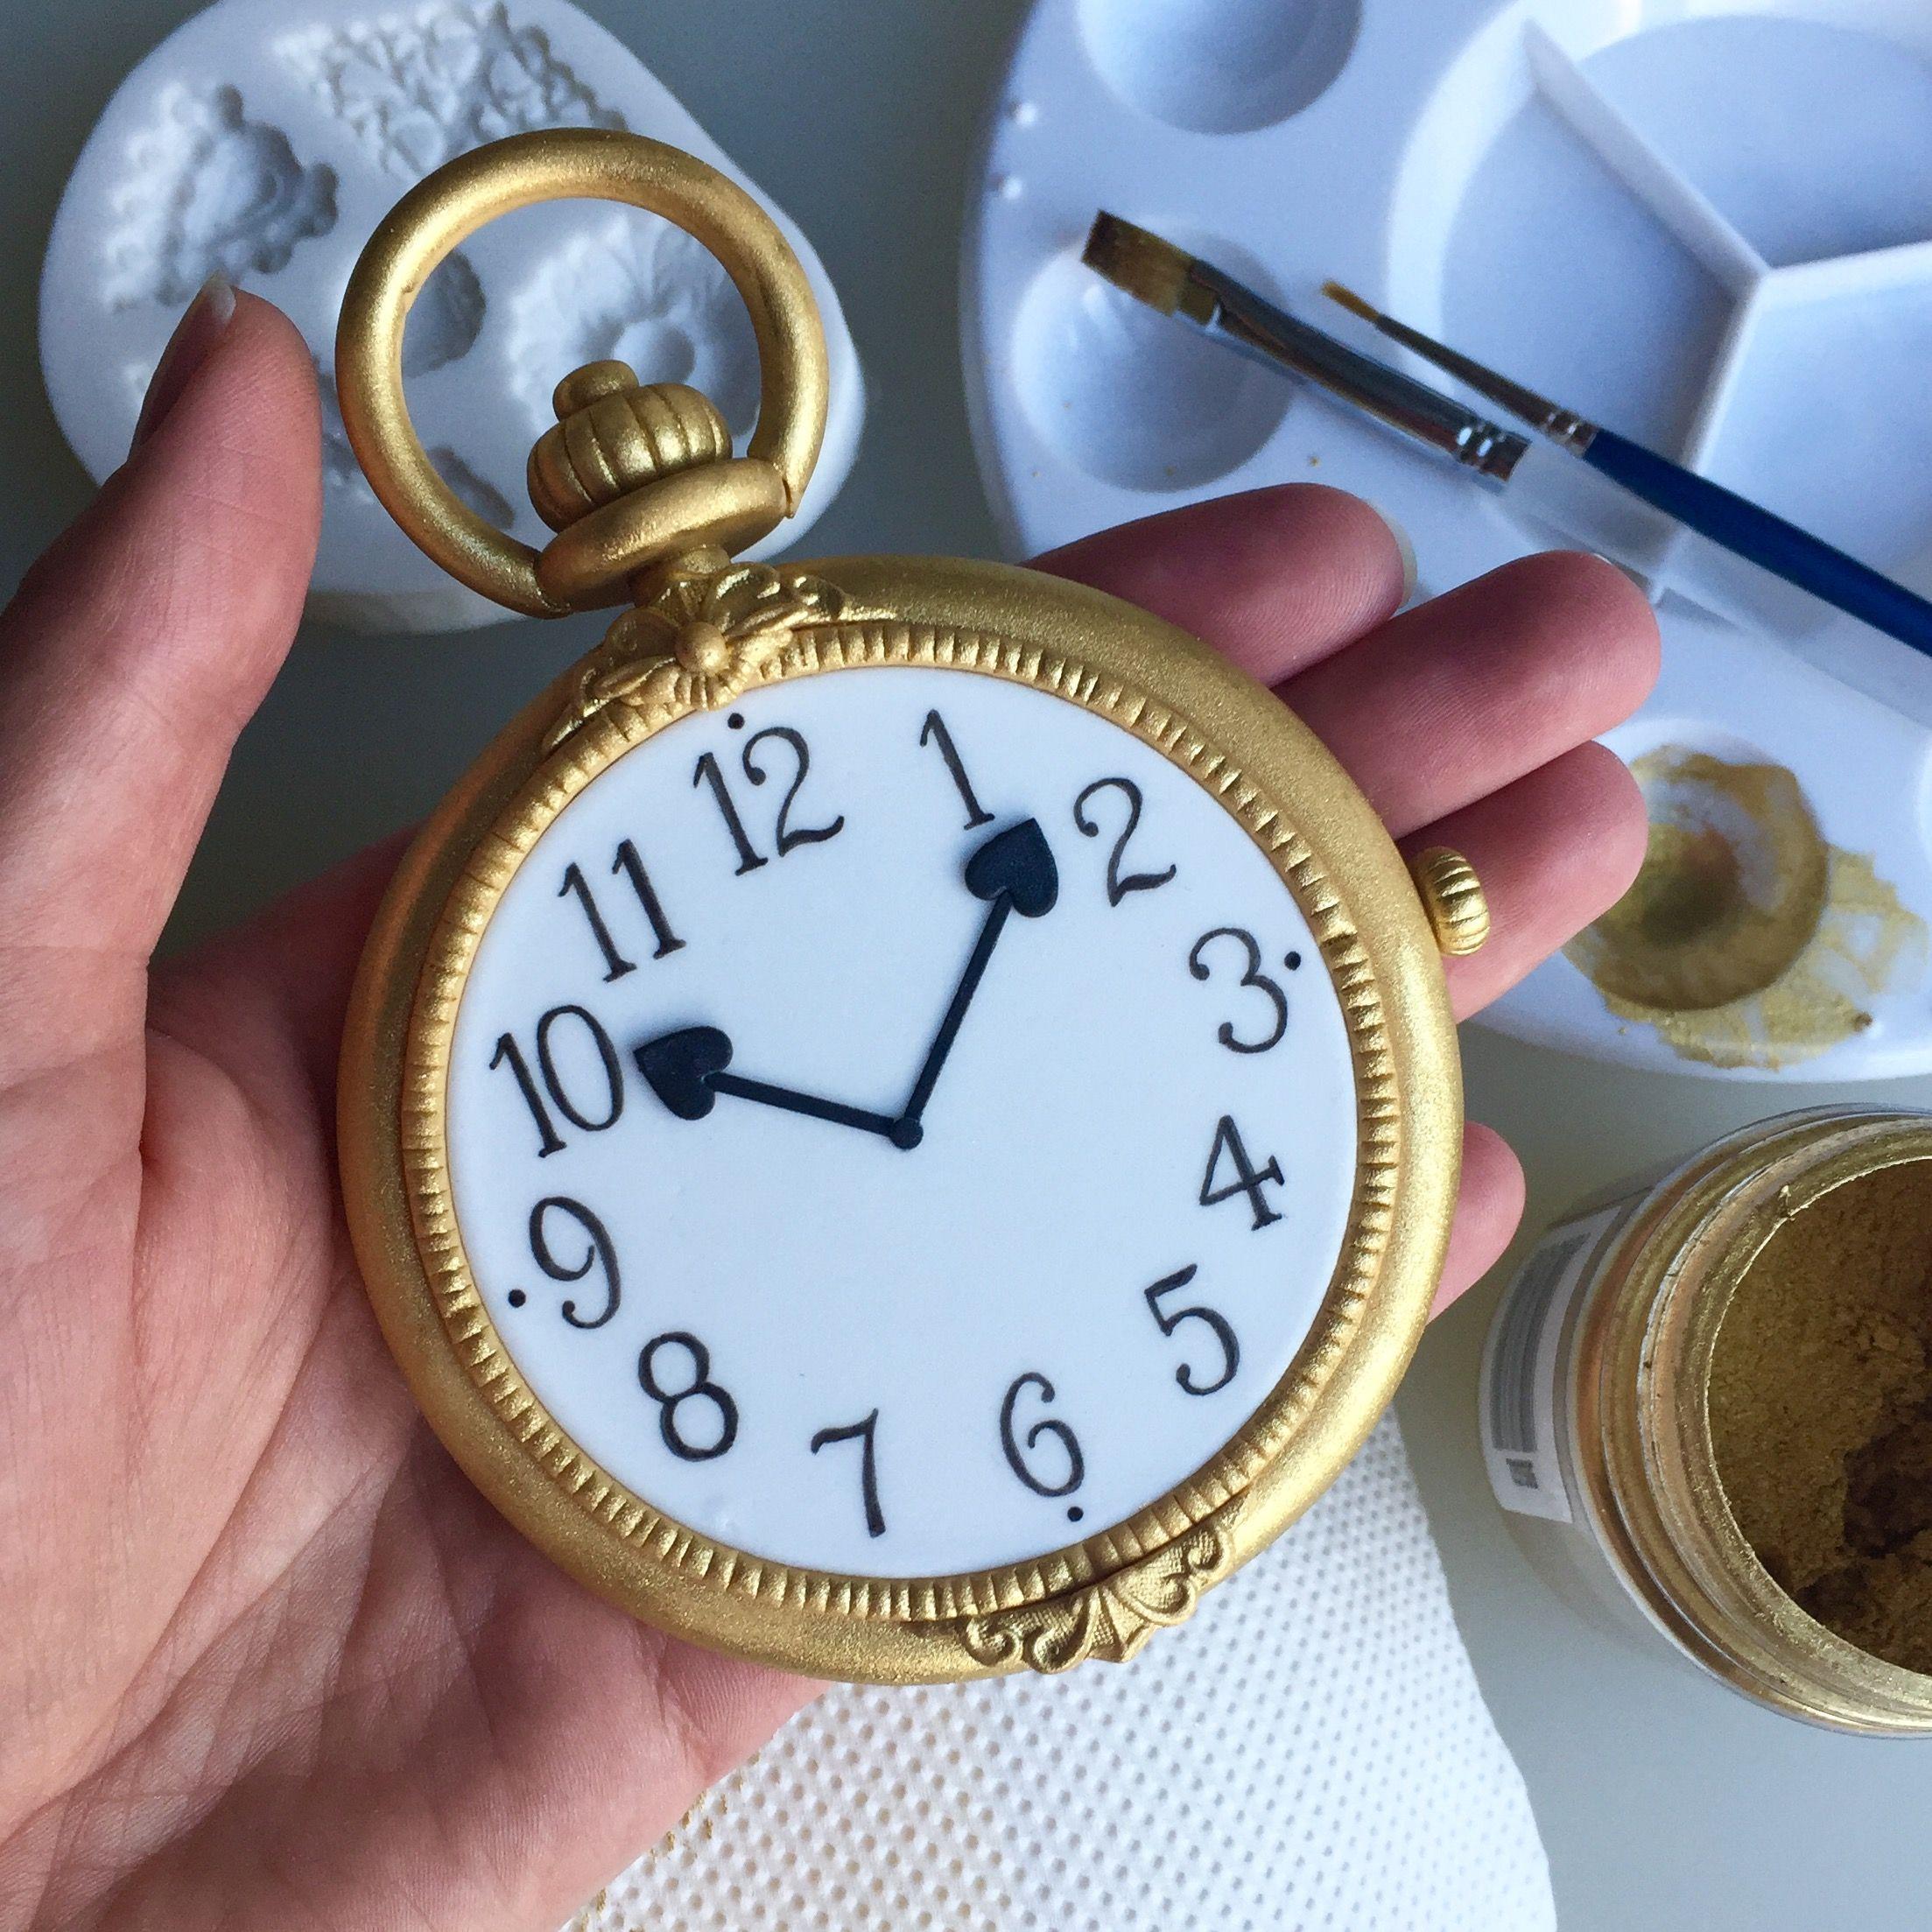 Pin By Gagan Sampla On Clocks: Alice In Wonderland Fondant Watch